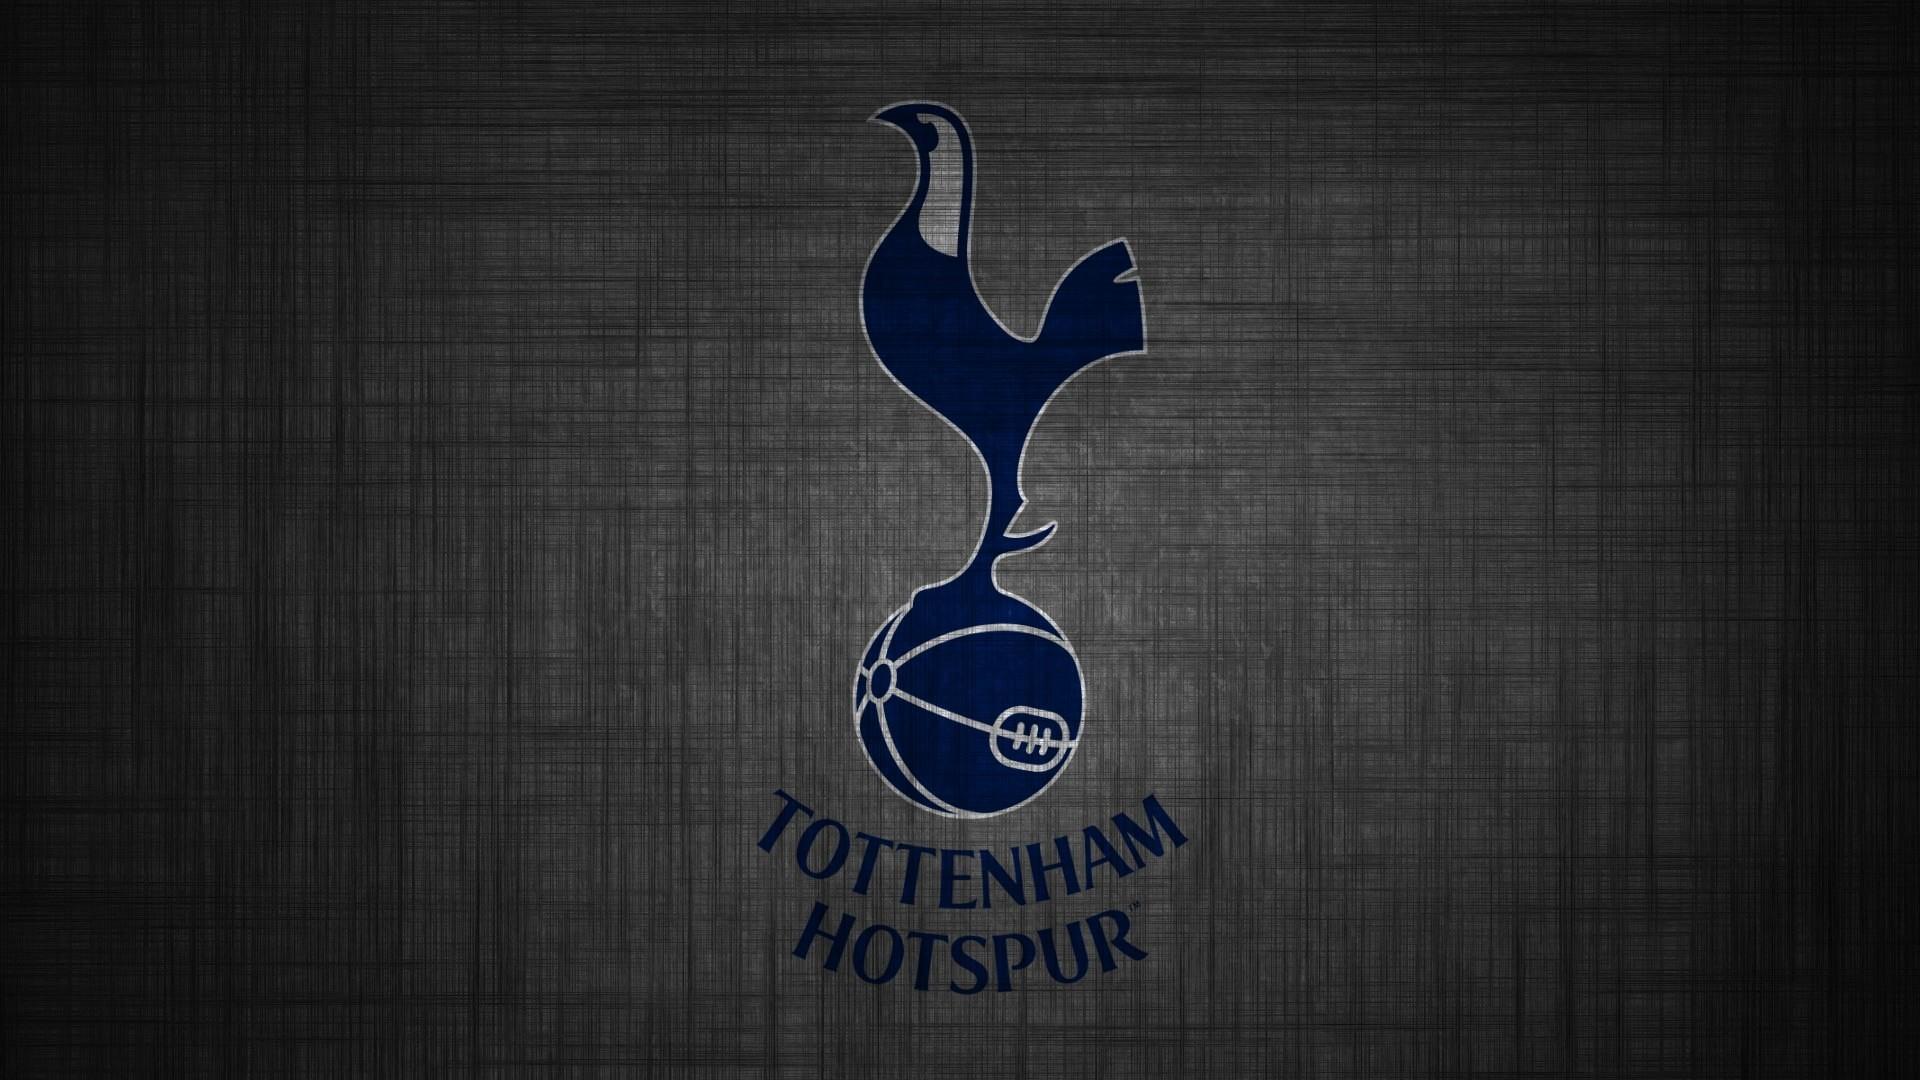 66 Tottenham Hotspur Wallpapers on WallpaperPlay 1920x1080